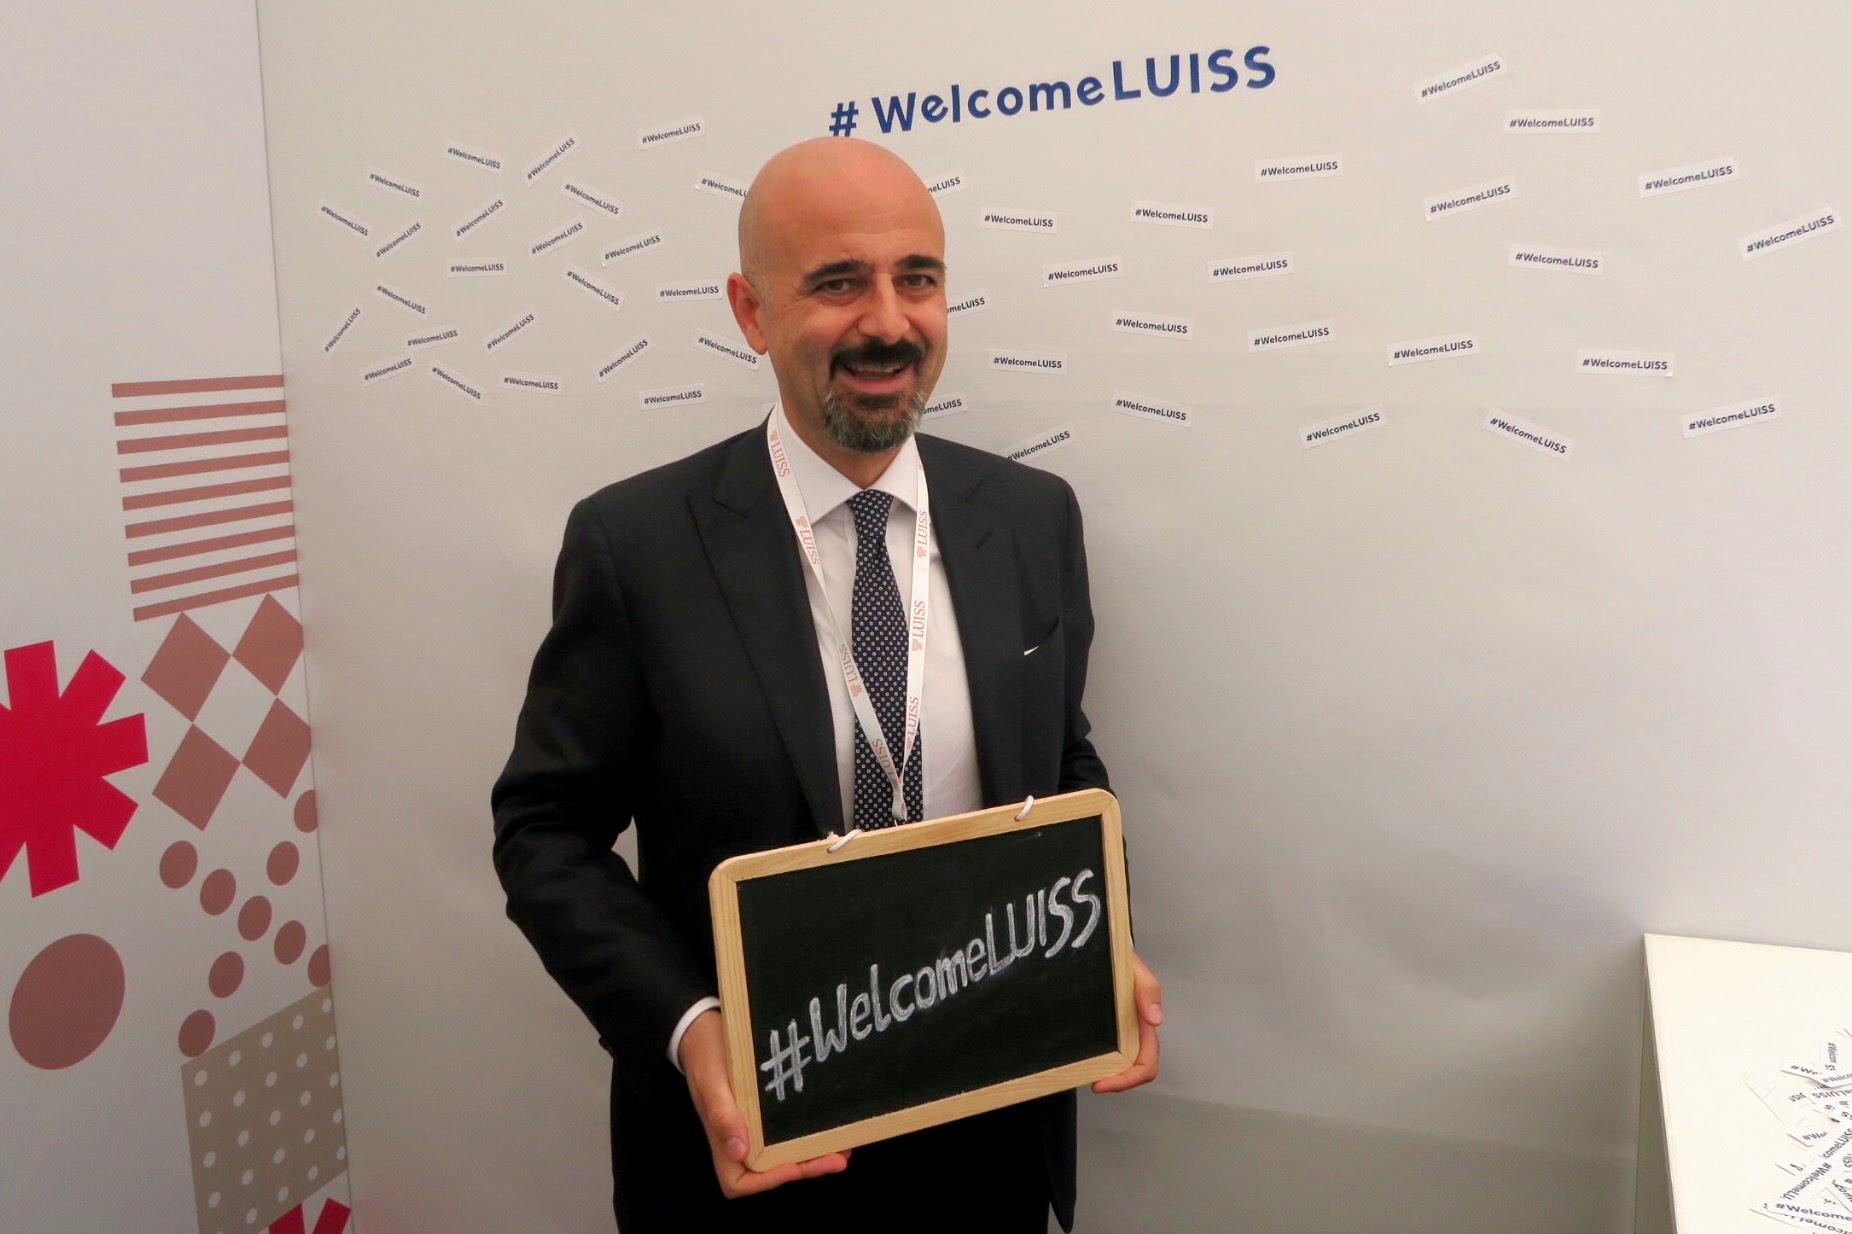 DG Welcome LUISS